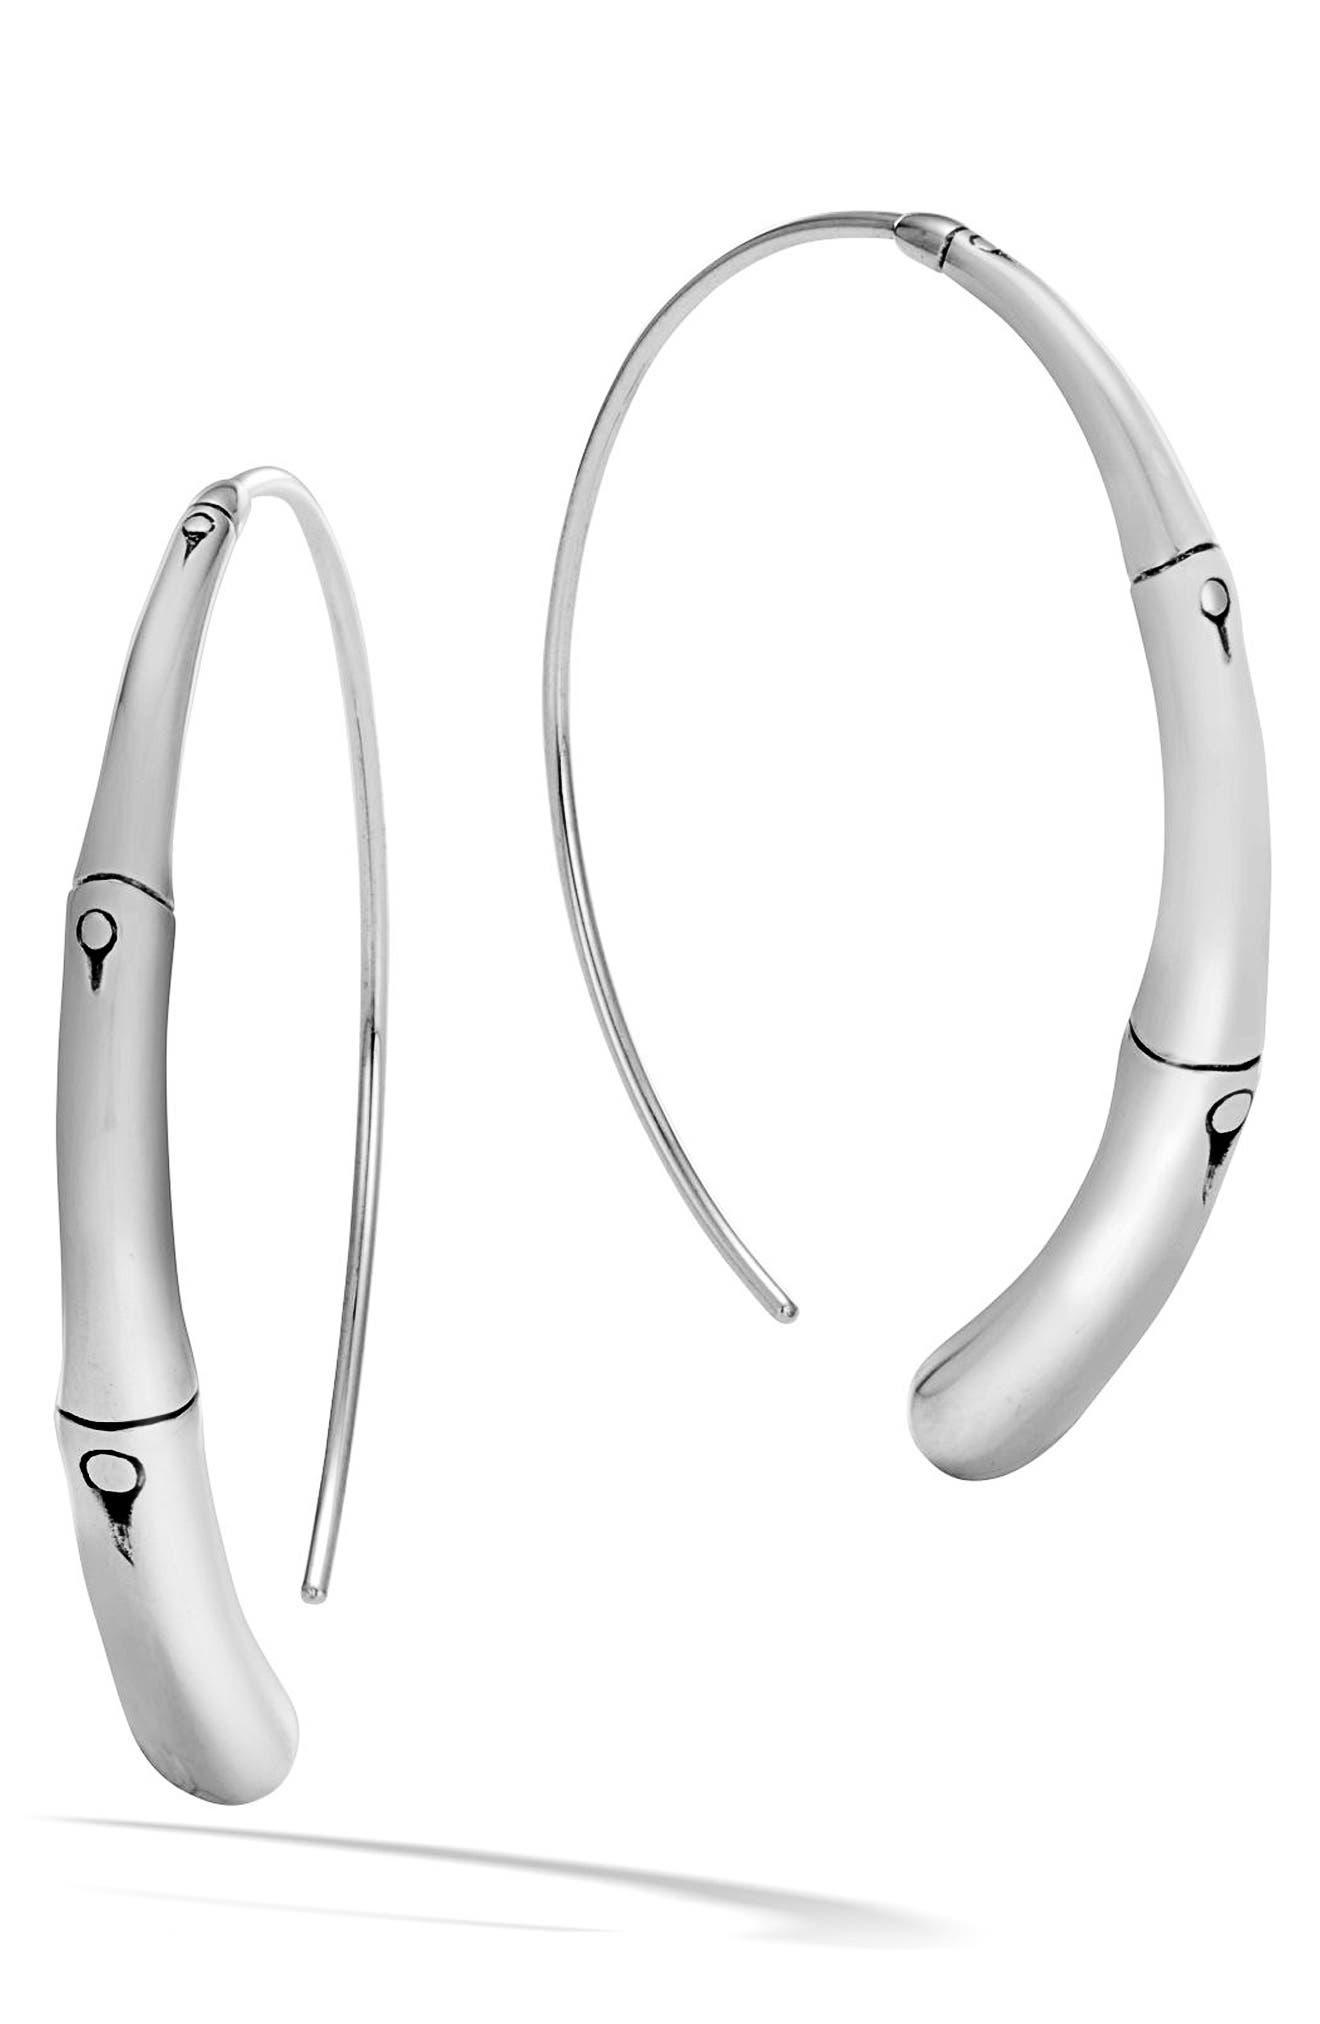 Bamboo Large Hoop Earrings,                             Main thumbnail 1, color,                             SILVER